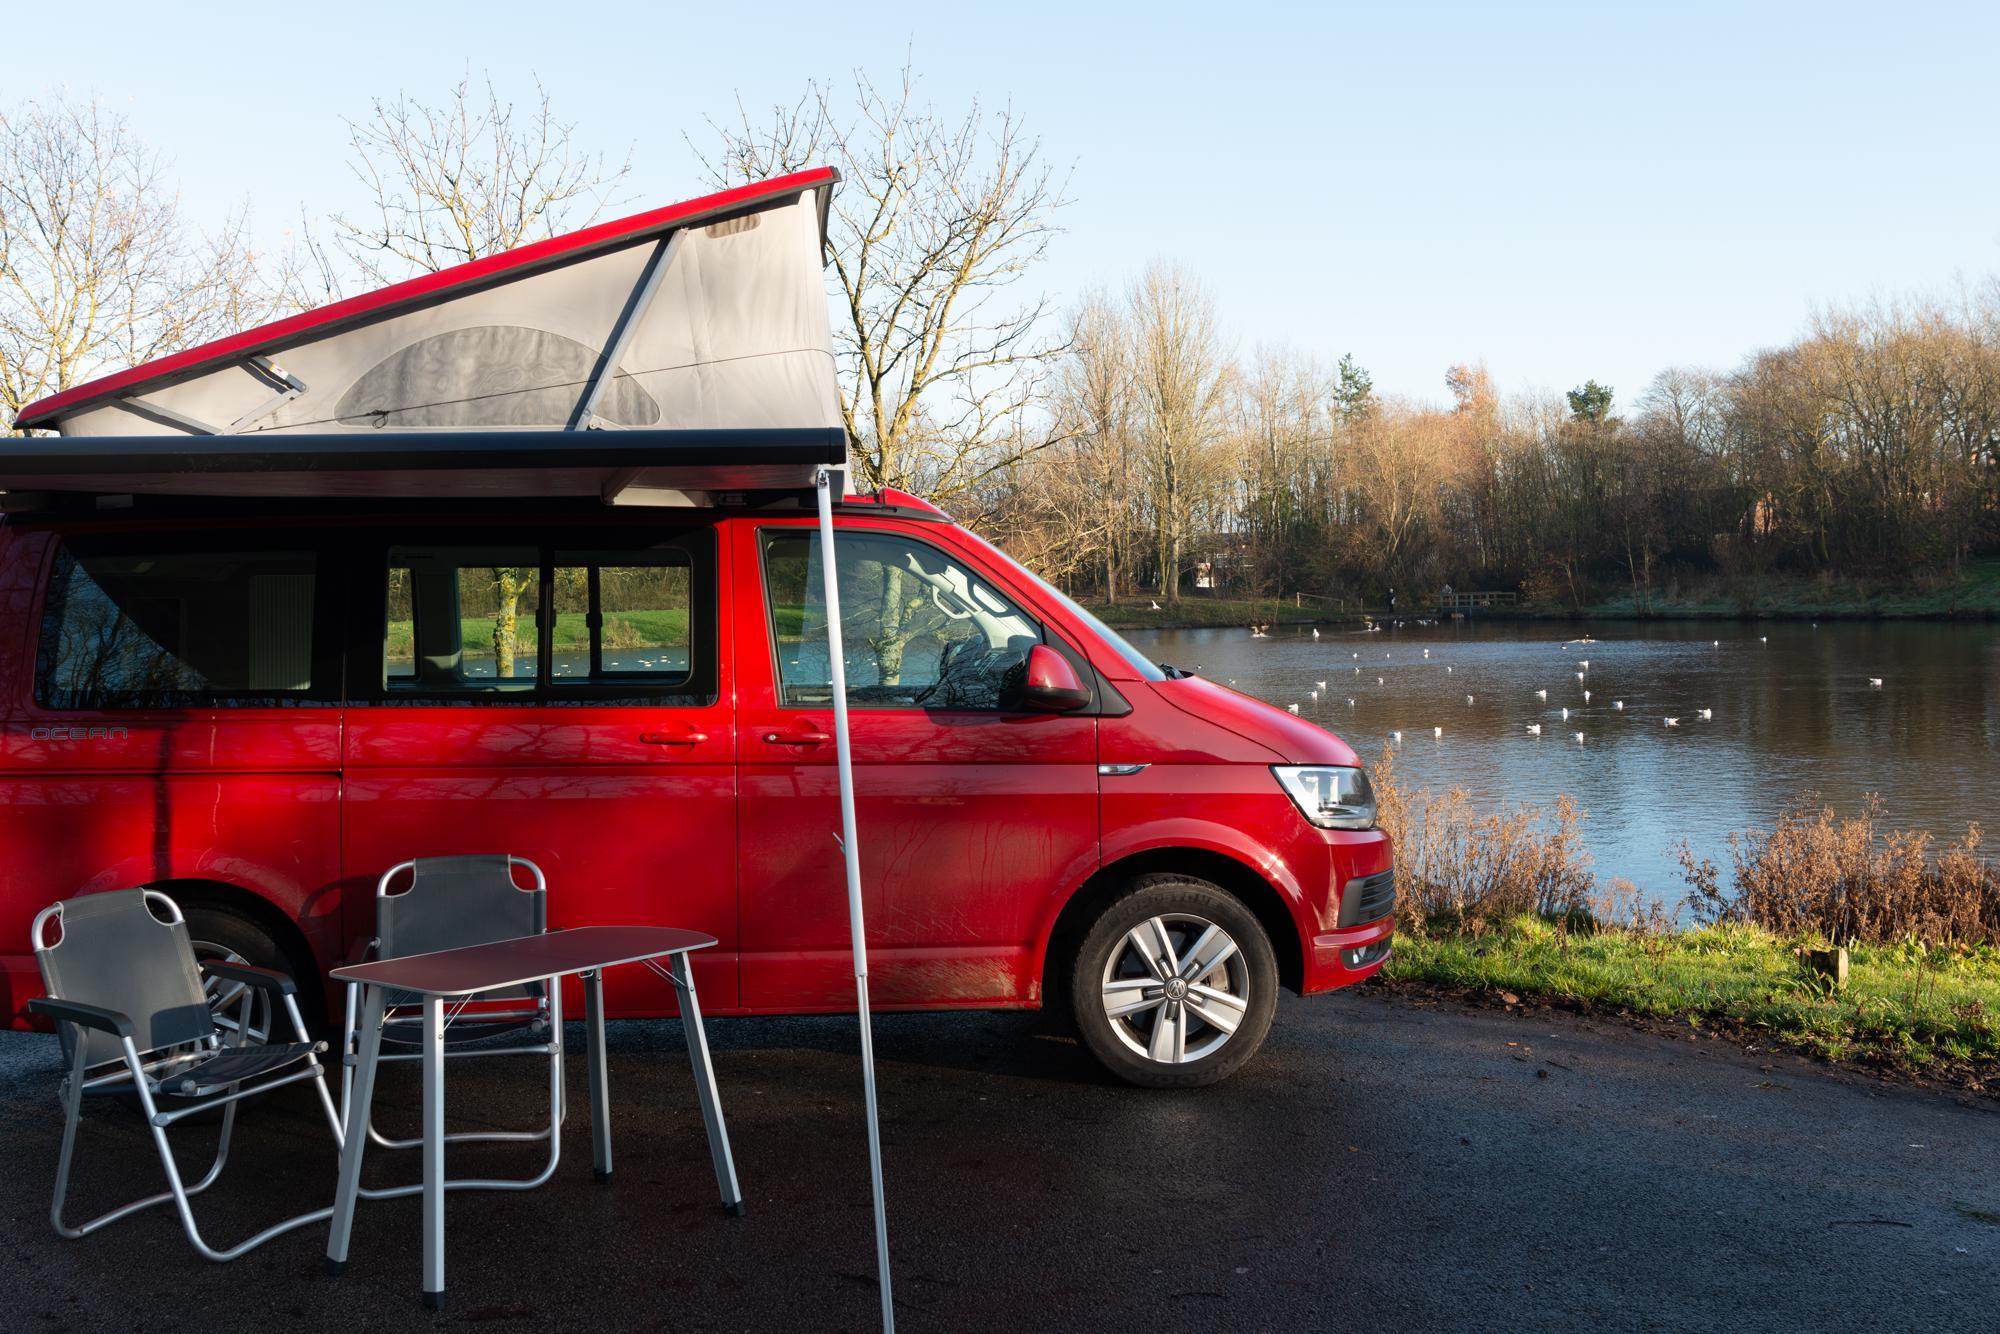 Campervans in Edinburgh holidays at Cool Camping